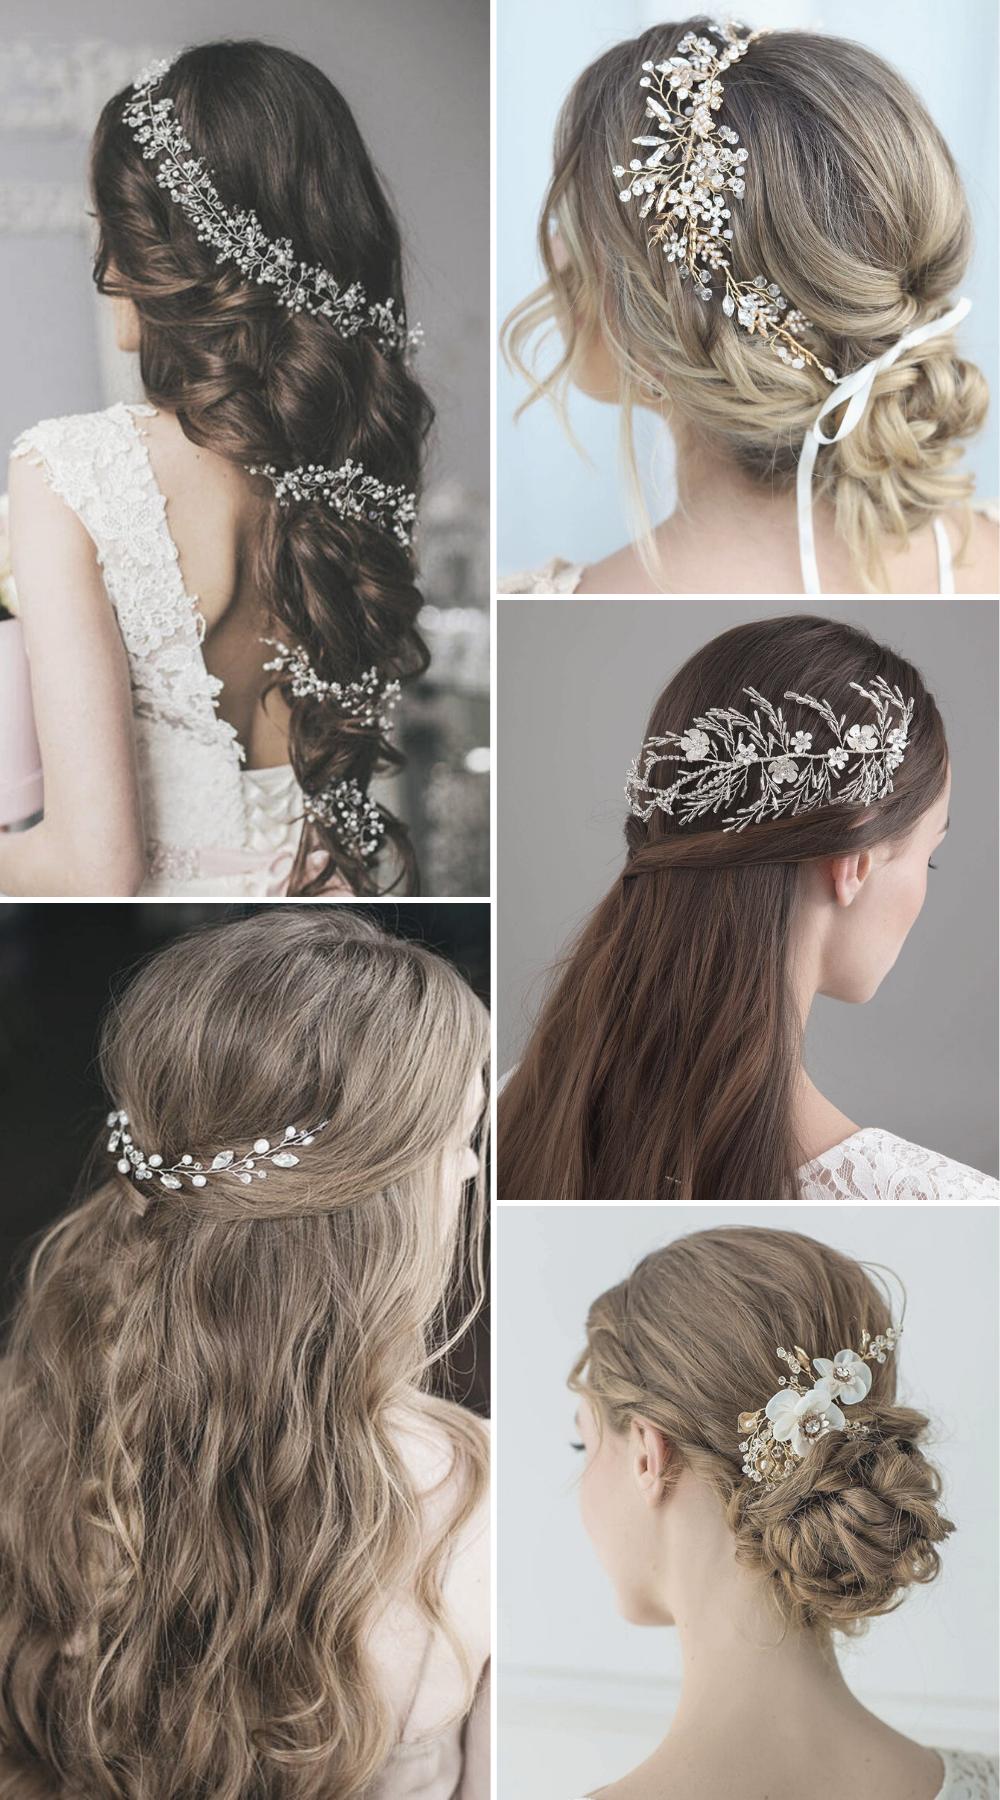 35 Glamorous Bride Wedding Hairstyle Accessories Ideas Tips Wedding Ideas In 2020 Bohemian Wedding Hair Wedding Hair Accessories Vintage Wedding Hair Accessories